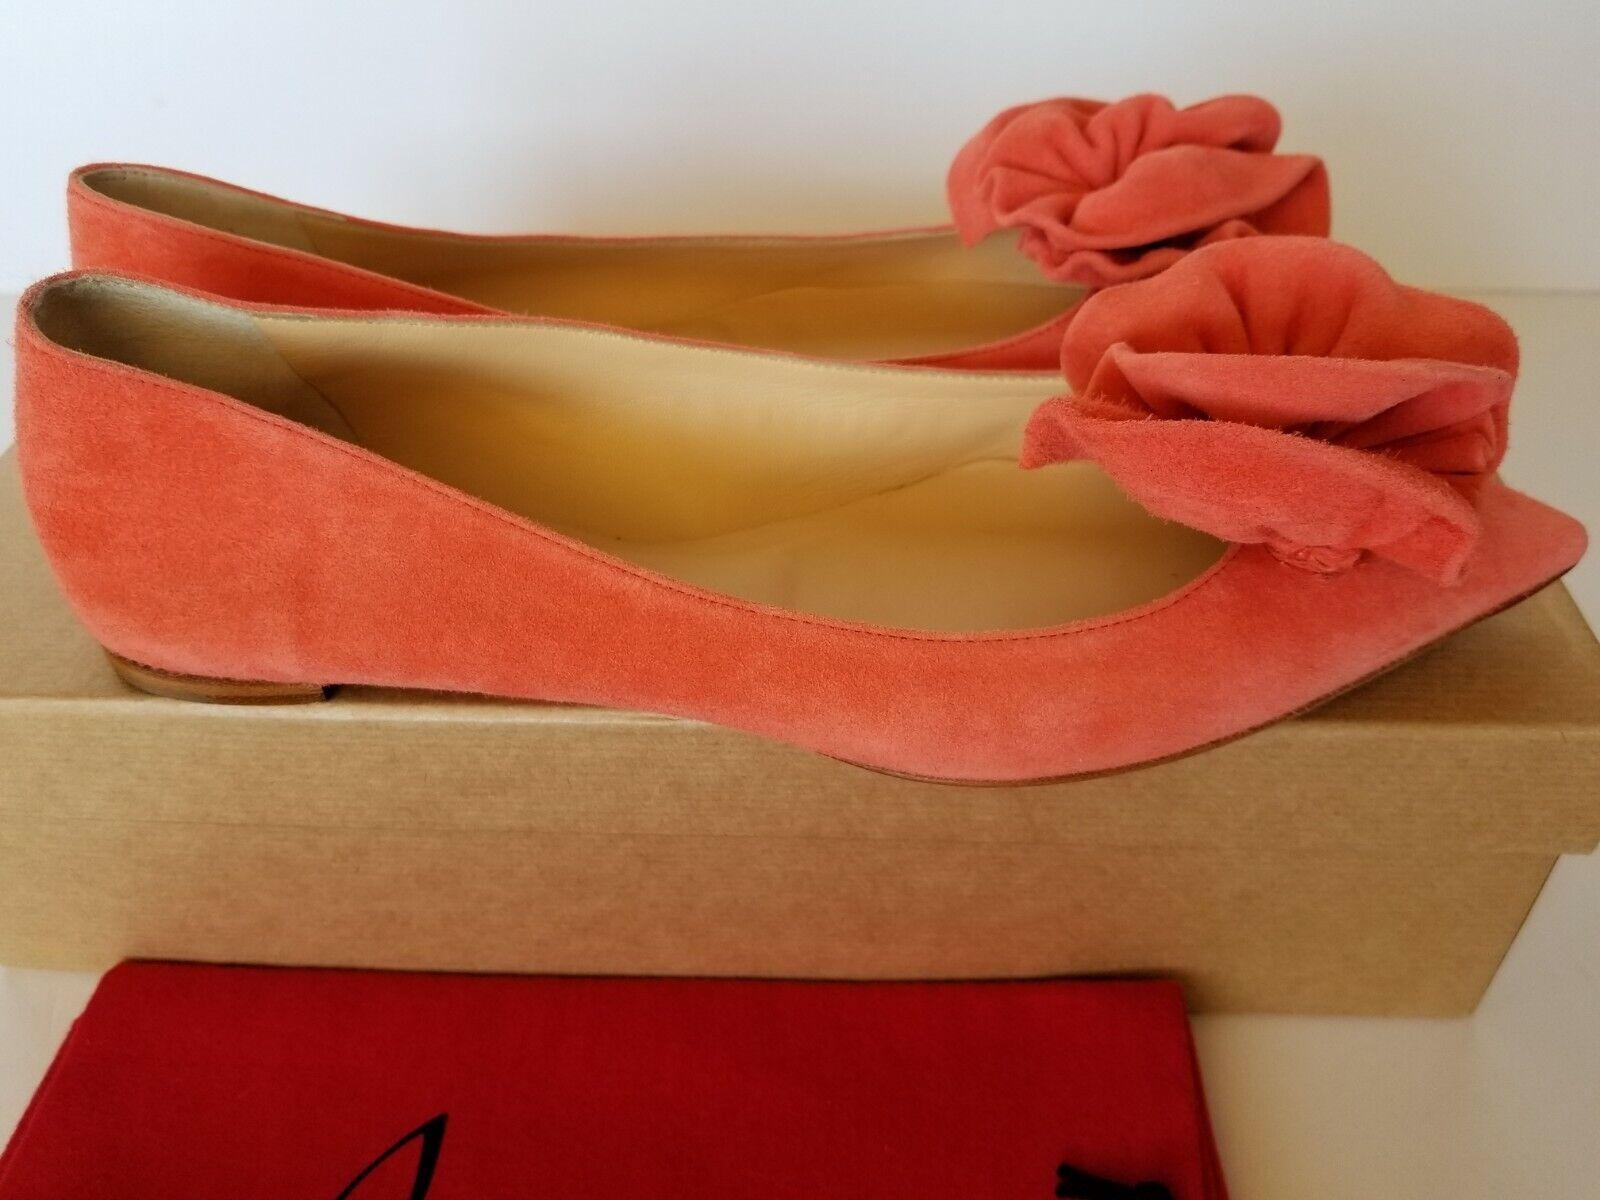 New Christian Louboutin Louboutin Louboutin Anemosia Suede Red Sole Ballet Flats Pump 39 9 b454a7